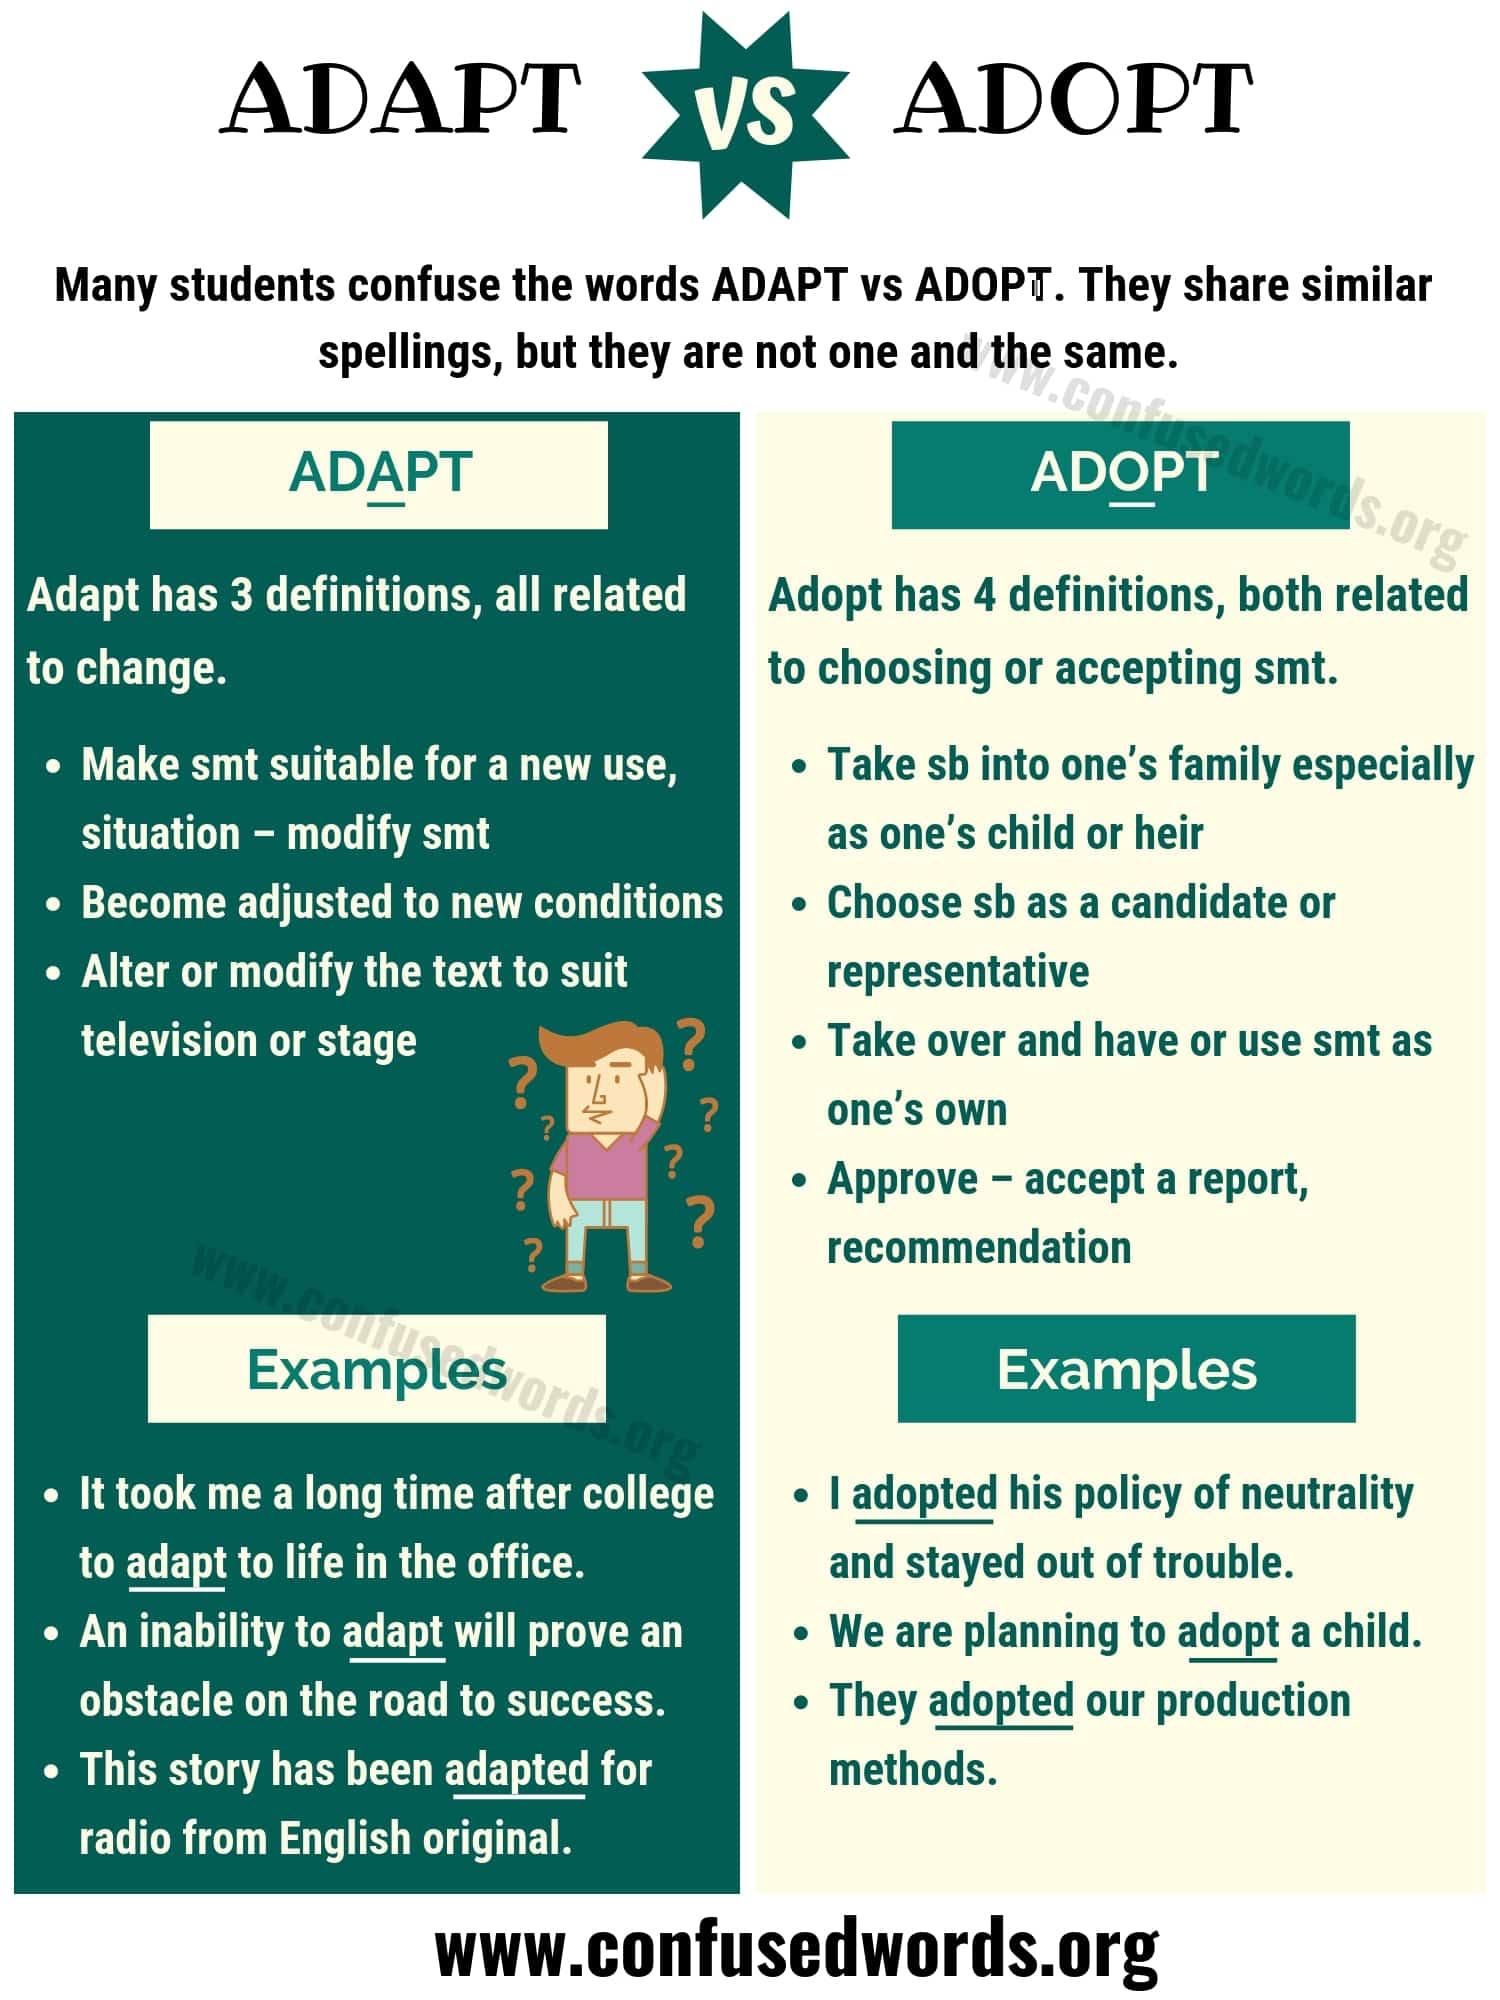 ADAPT vs ADOPT